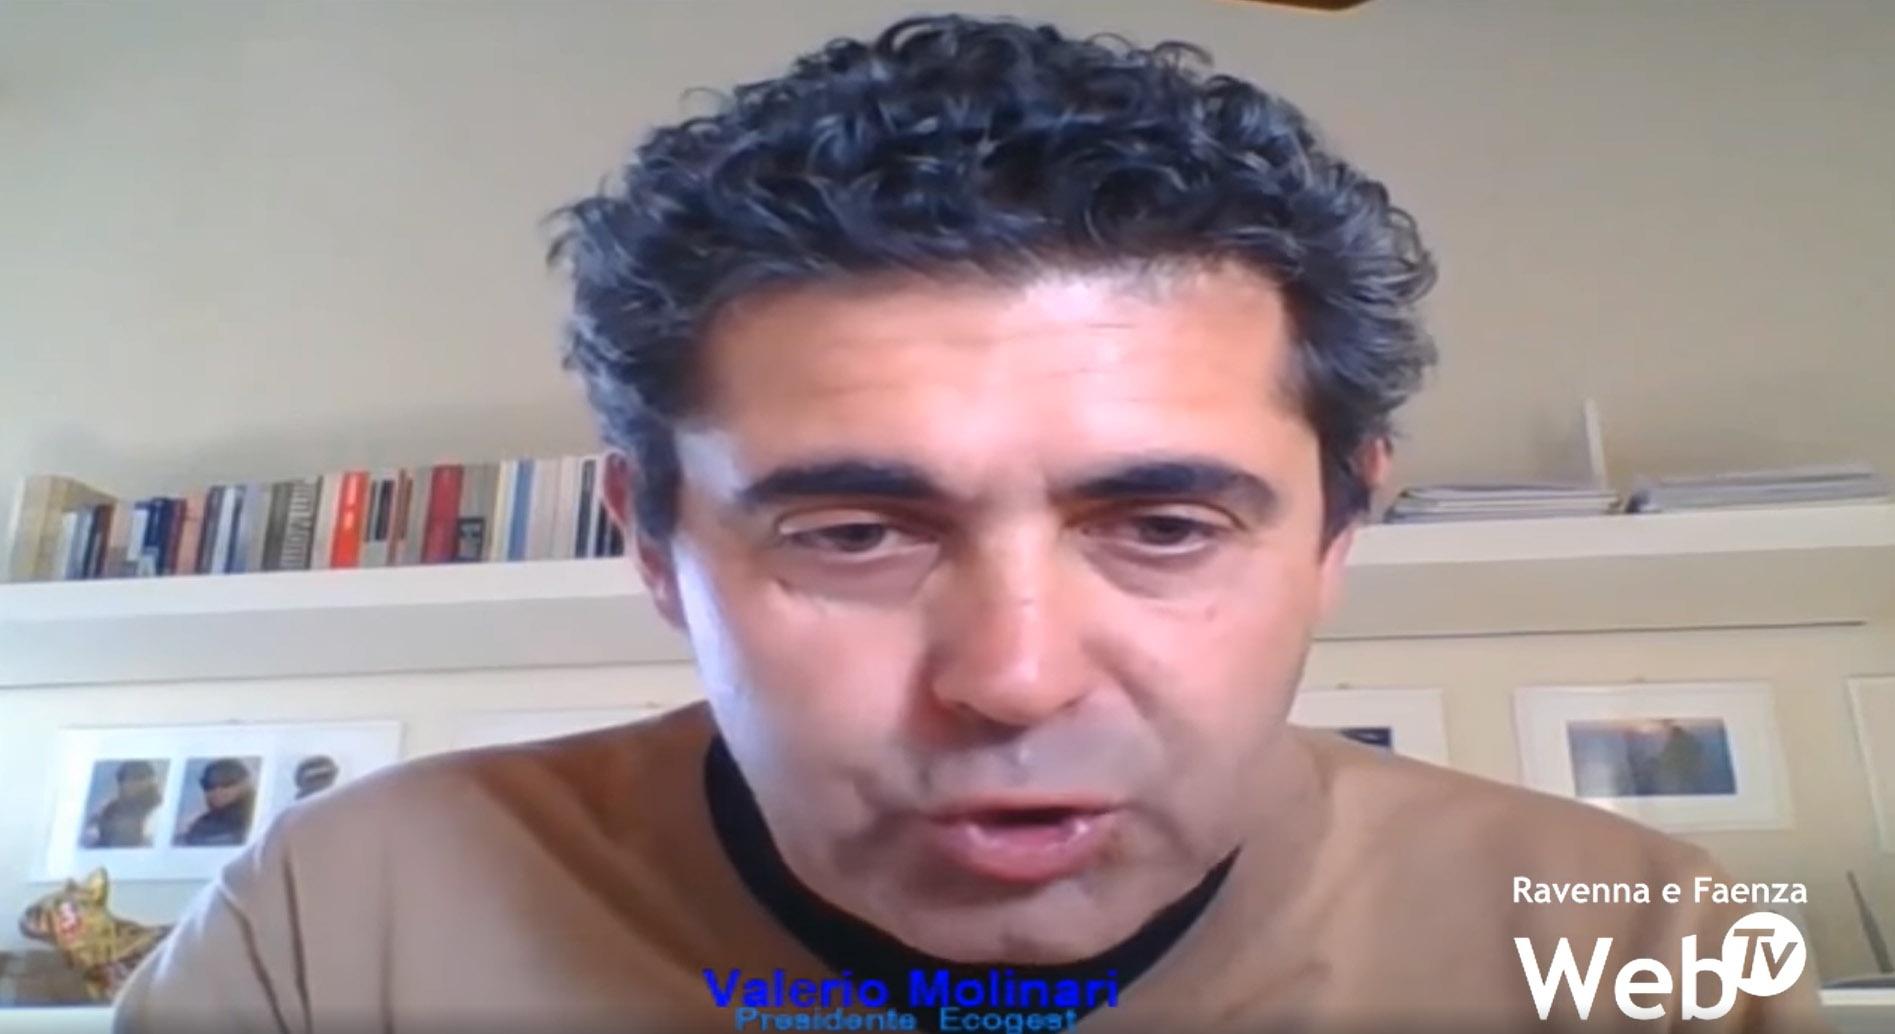 Intervista Molinari Ravenna web